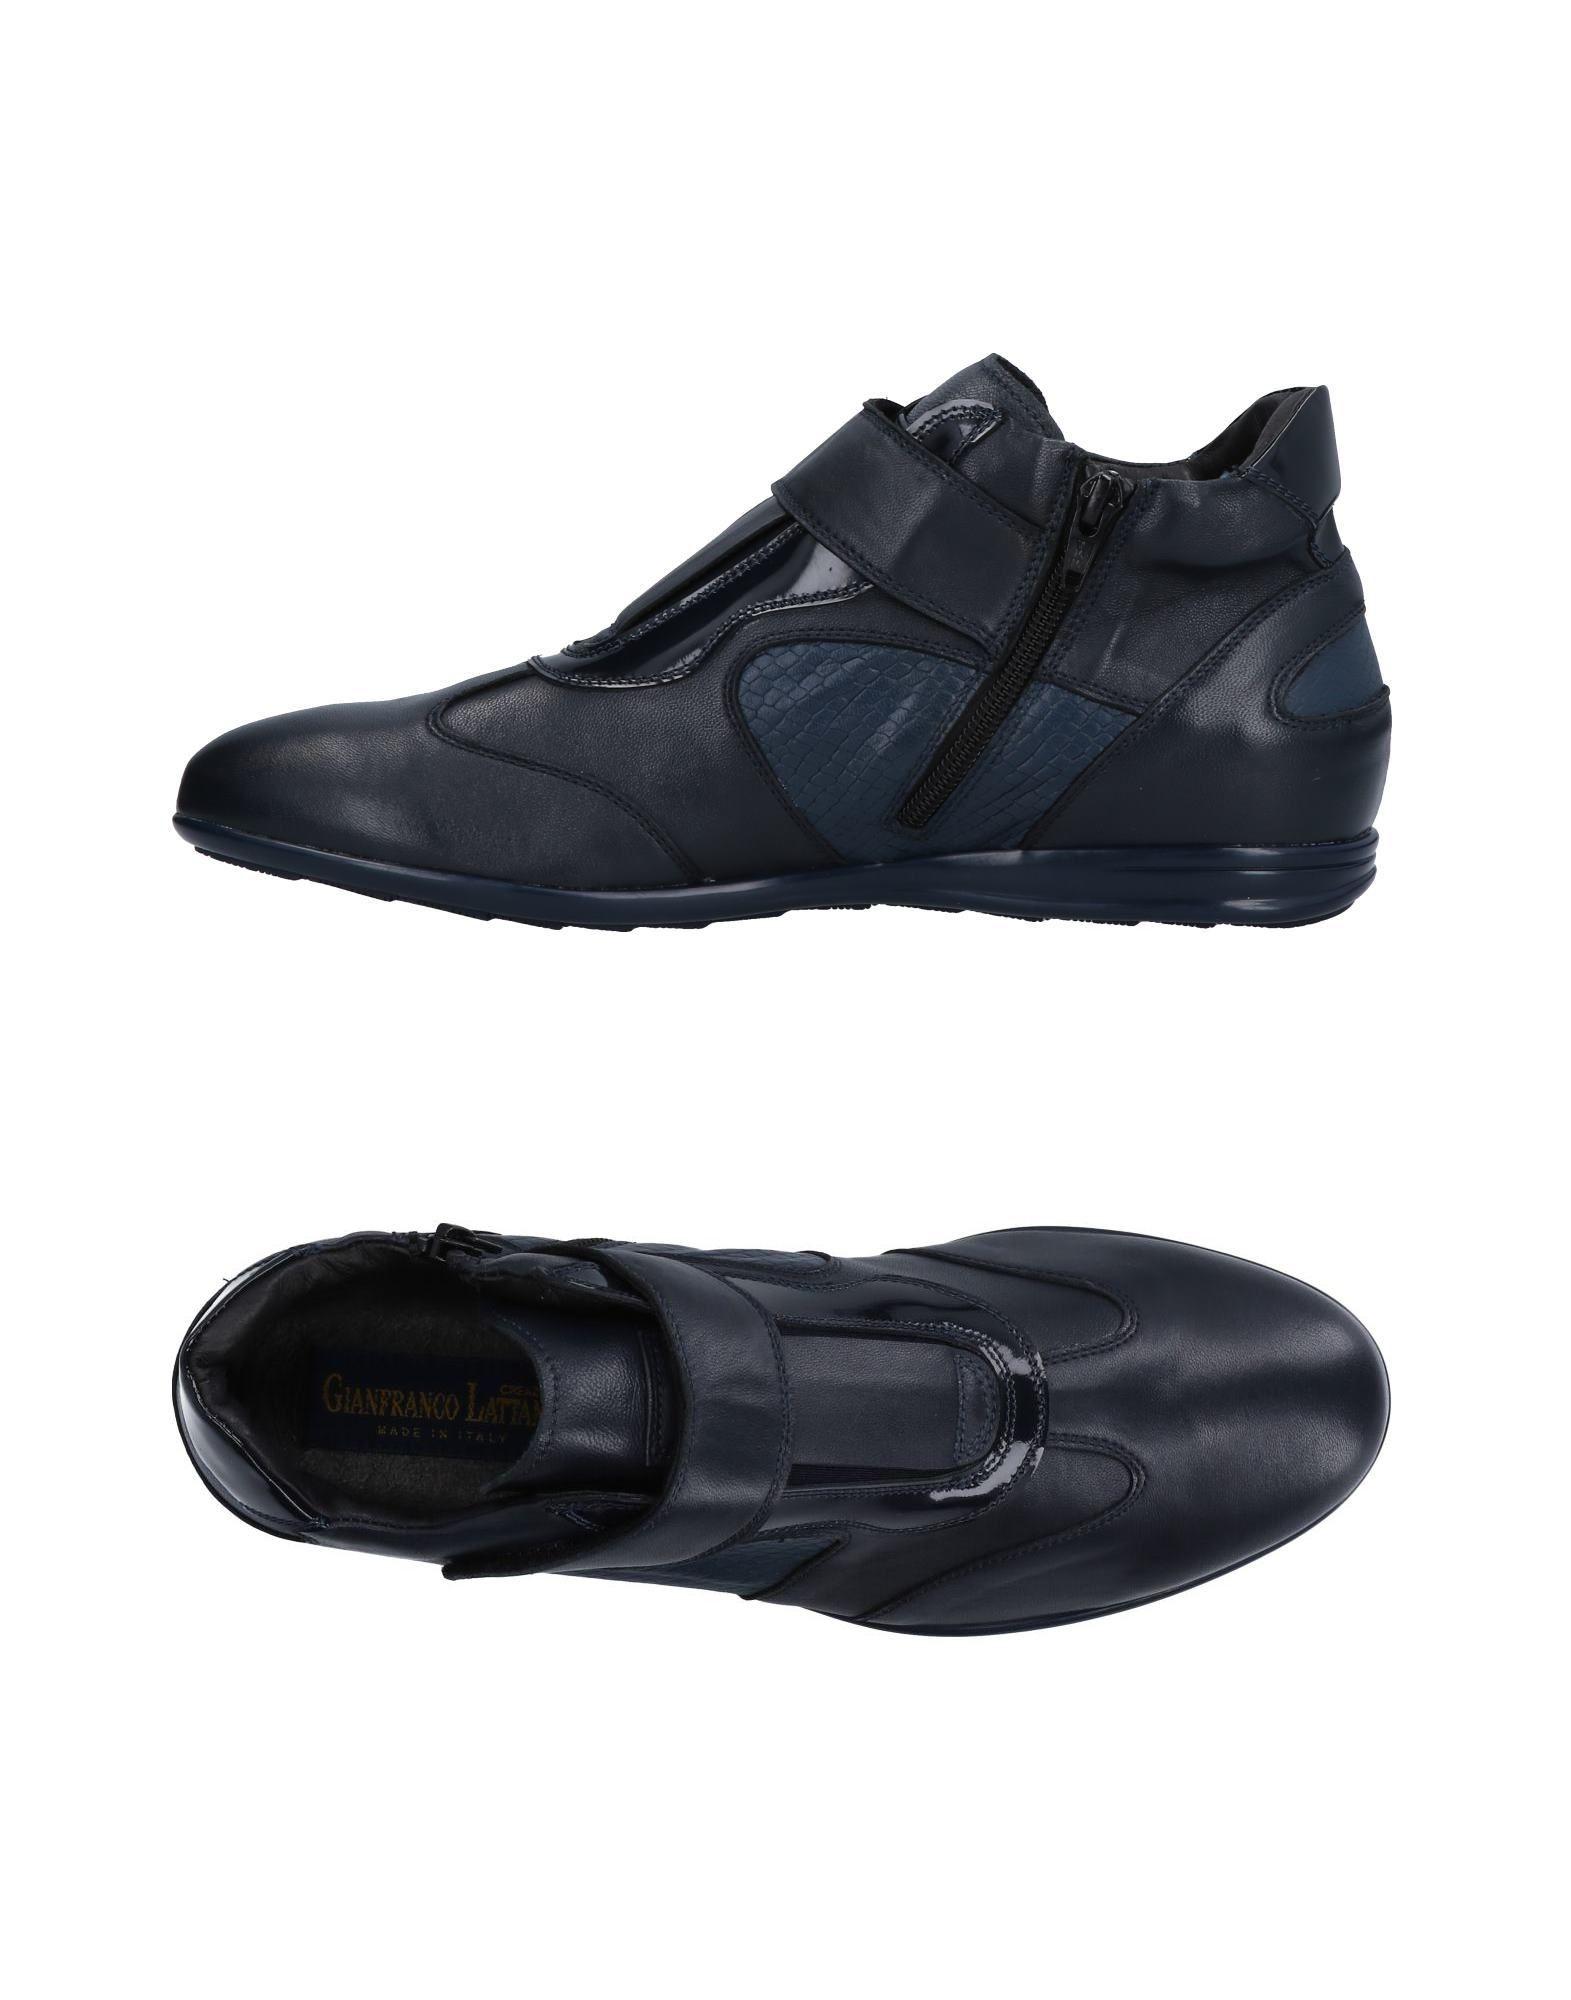 Sneakers Gianfranco Lattanzi Homme - Sneakers Gianfranco Lattanzi  Noir Confortable et belle